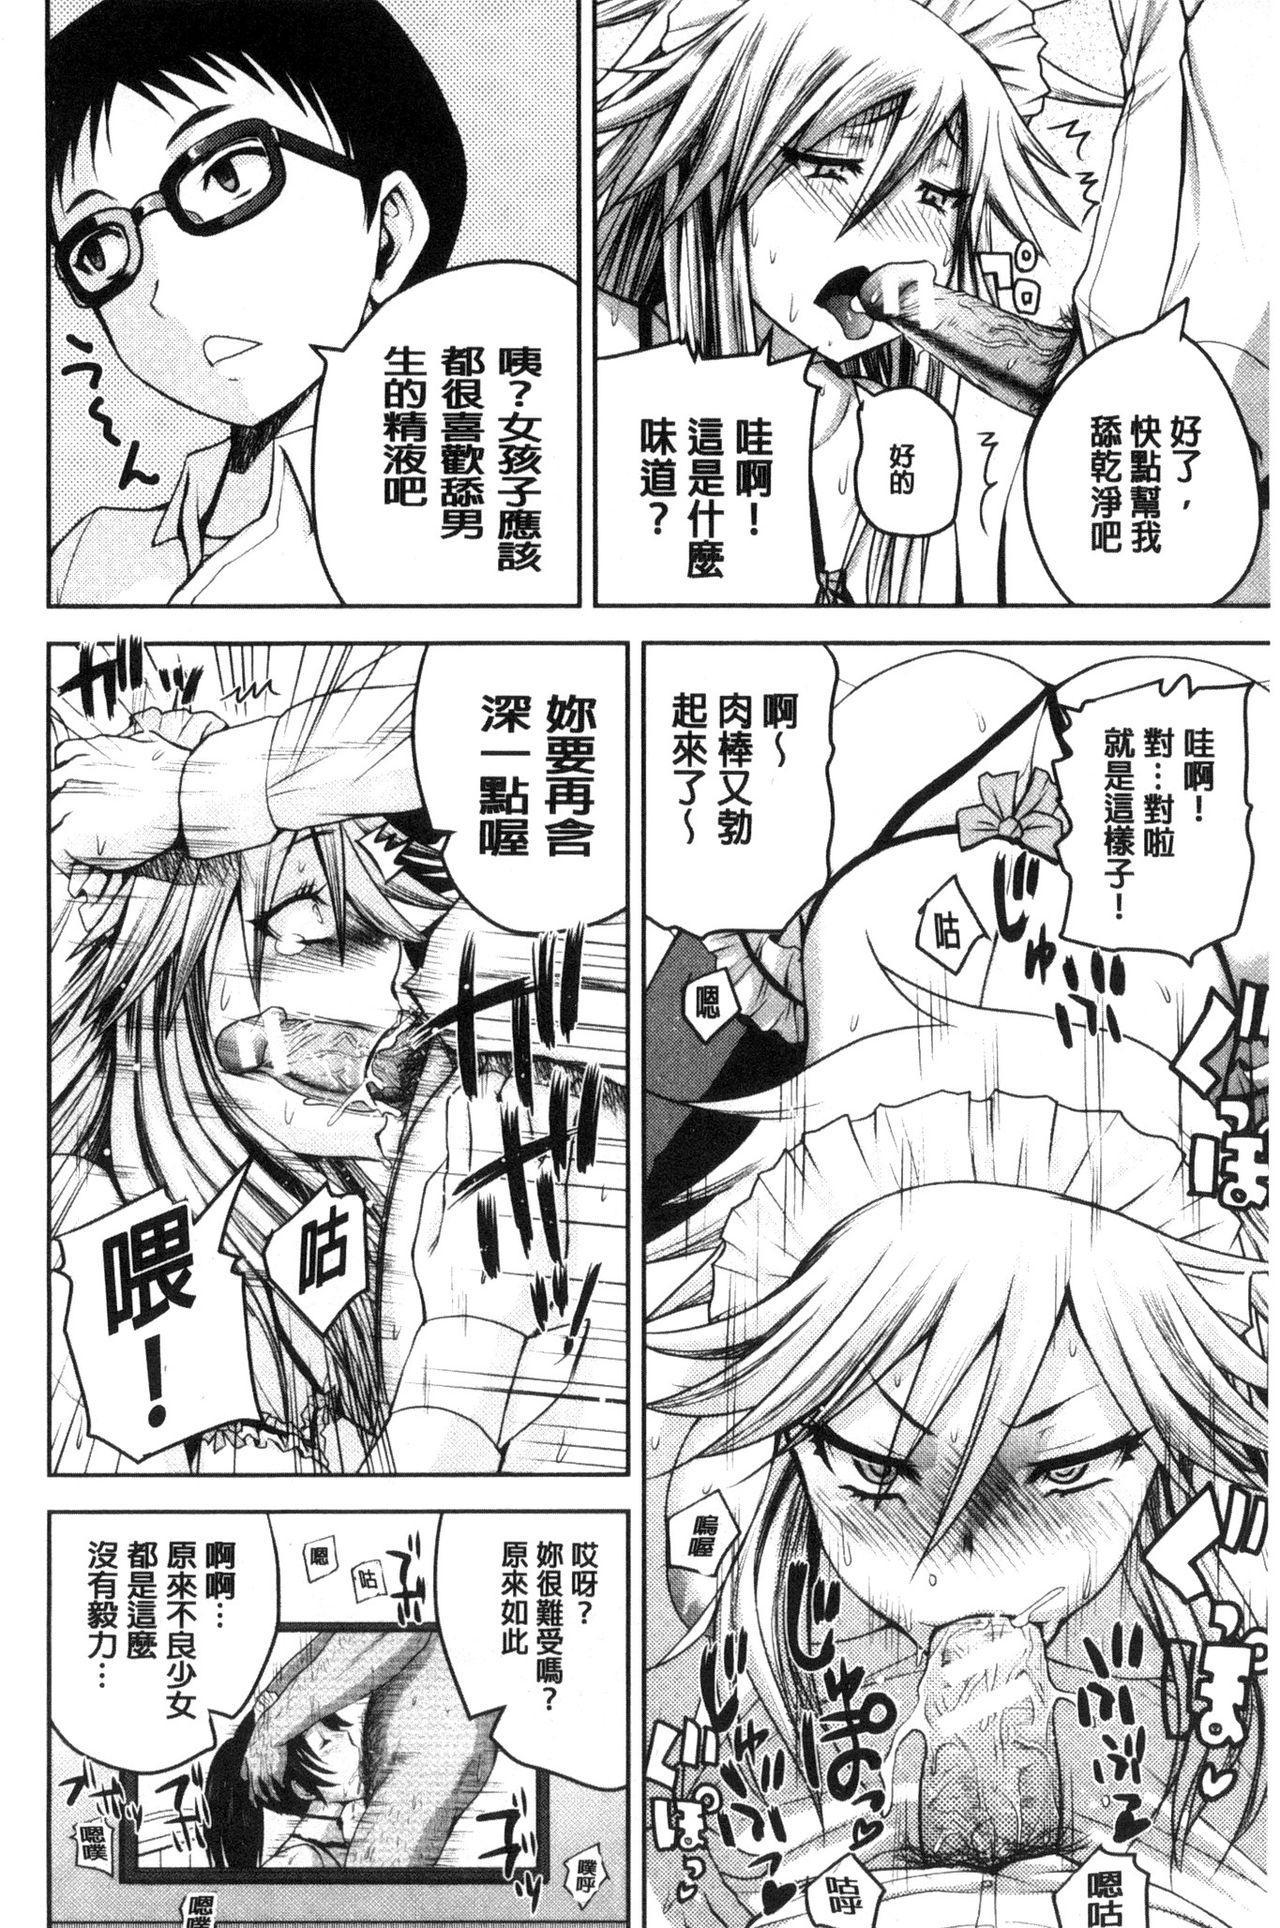 Opink Health Seibo no Fukuin 92